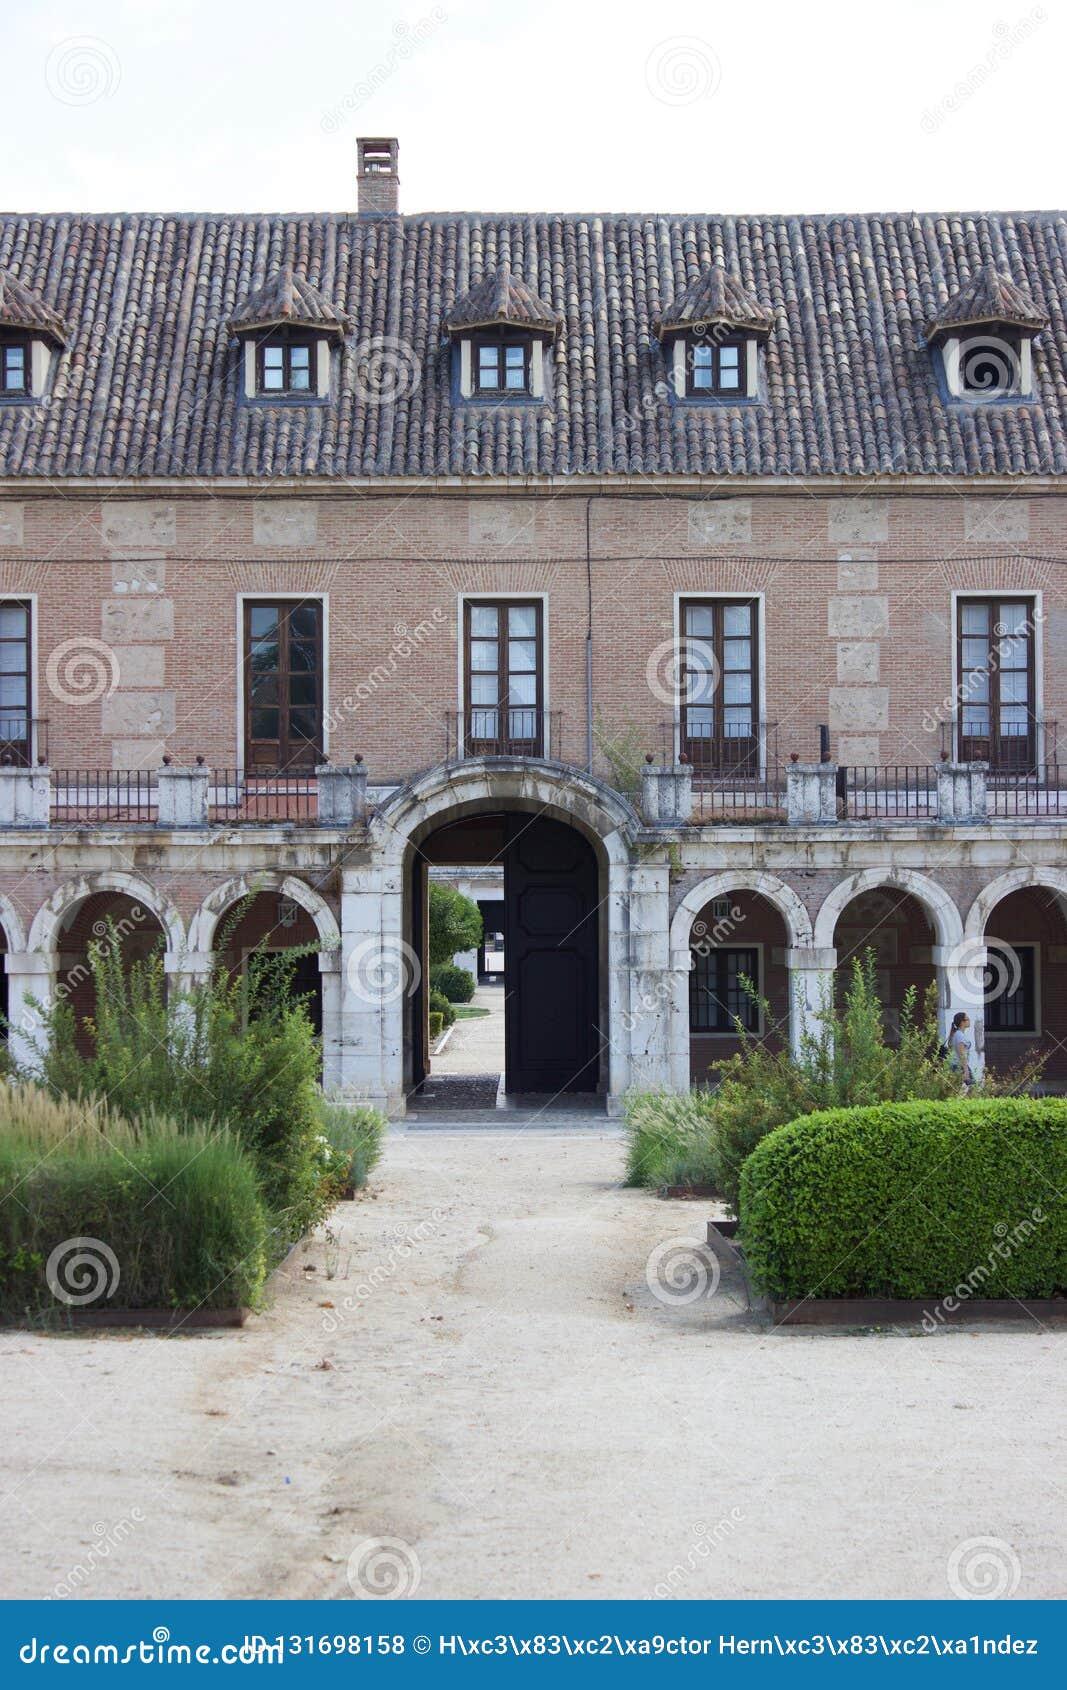 Aranjuez, Spain; November 12, 2018: Royal palace side facade acess gate and garden